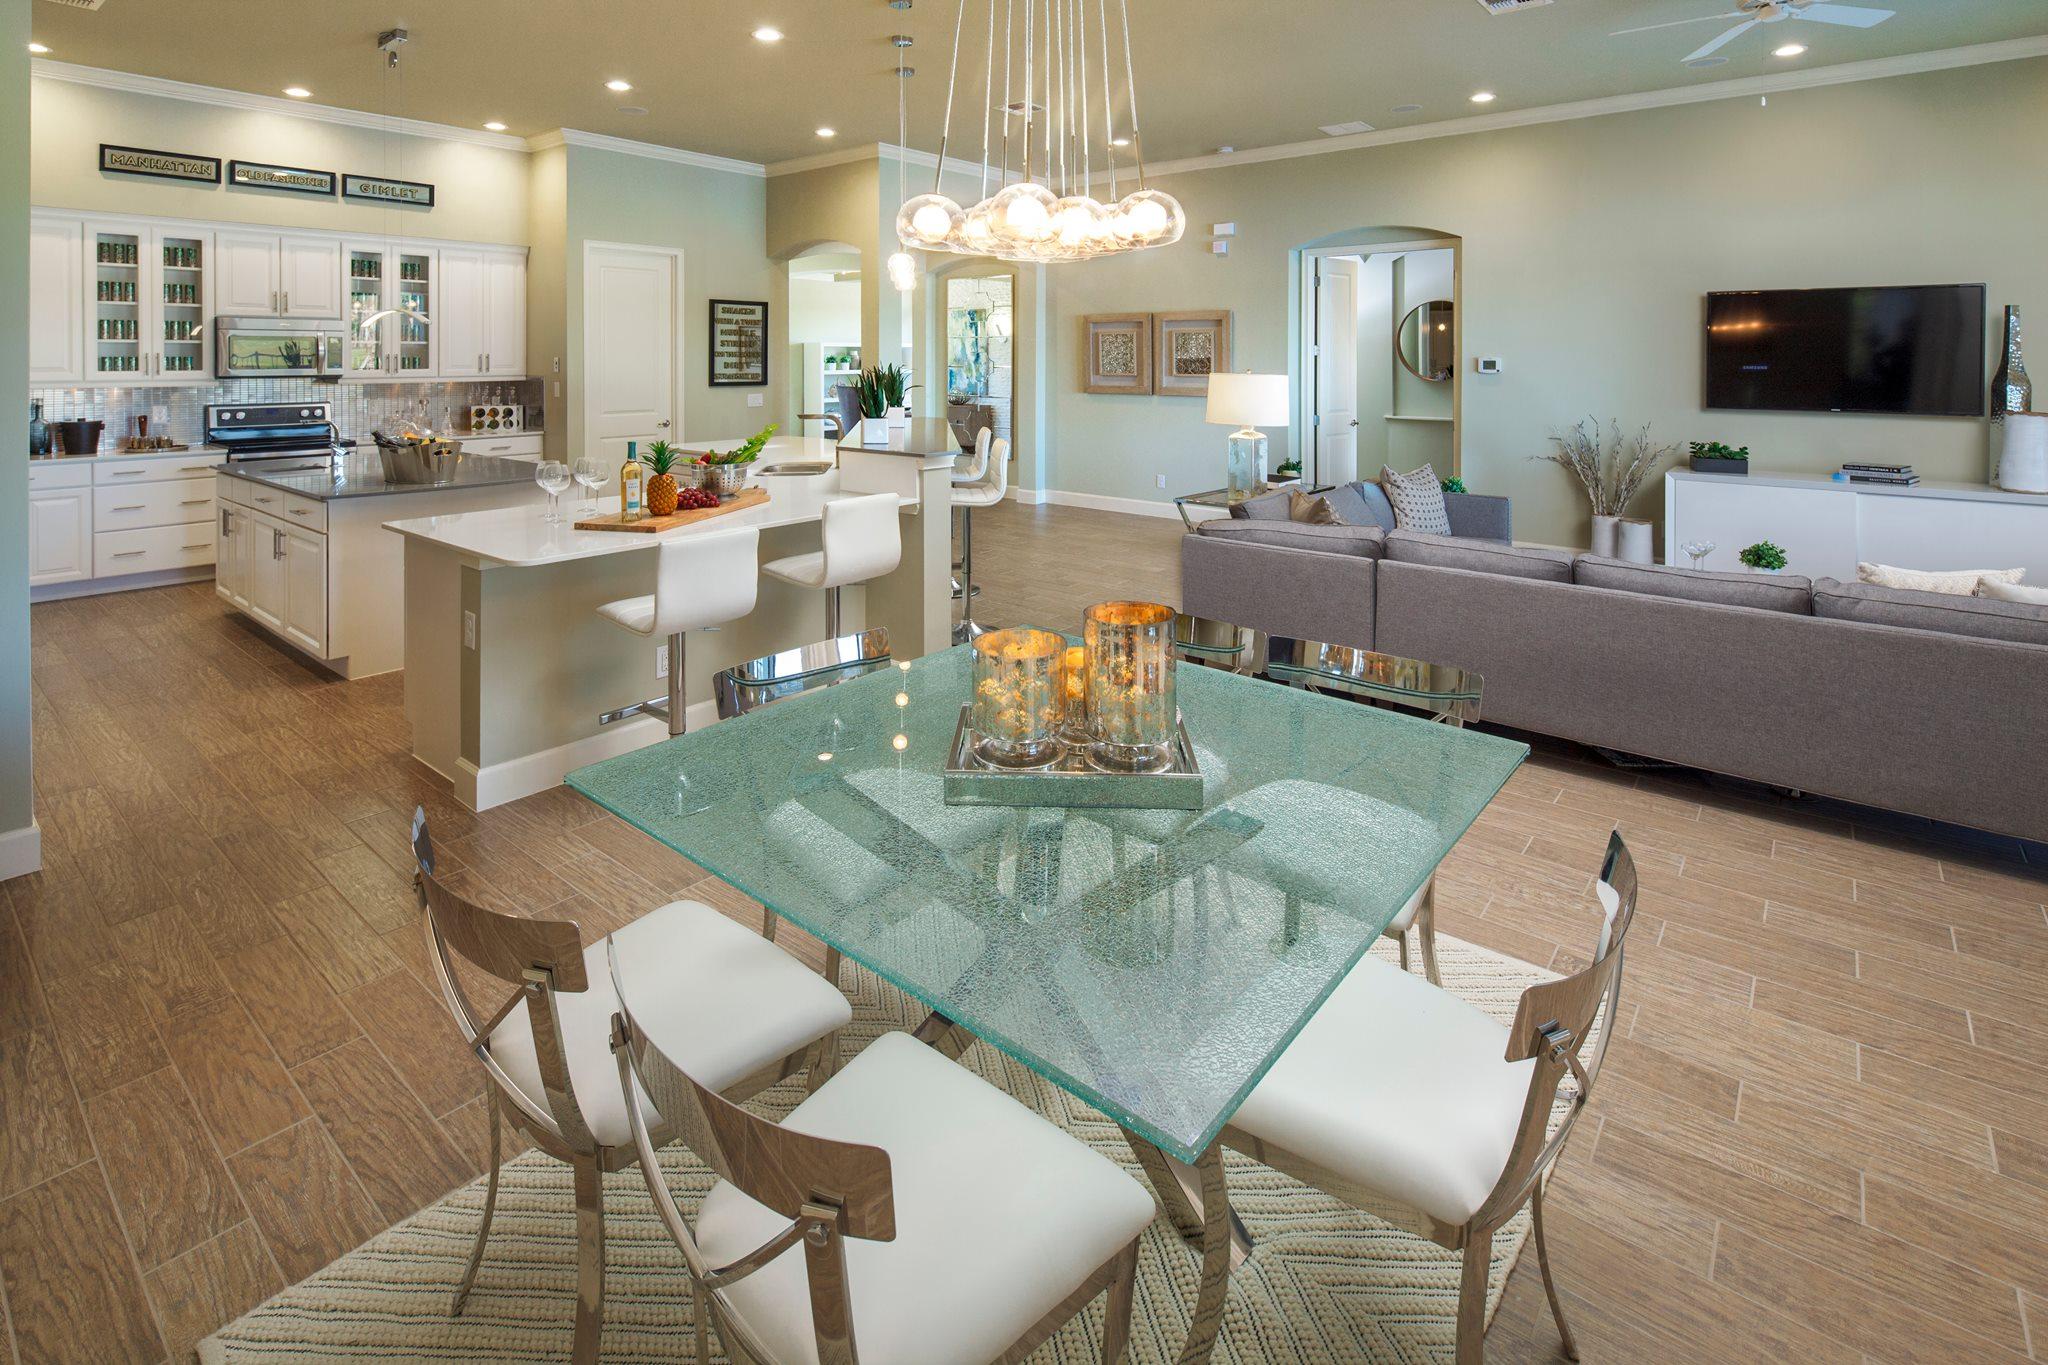 Job growth propels Florida property investment market